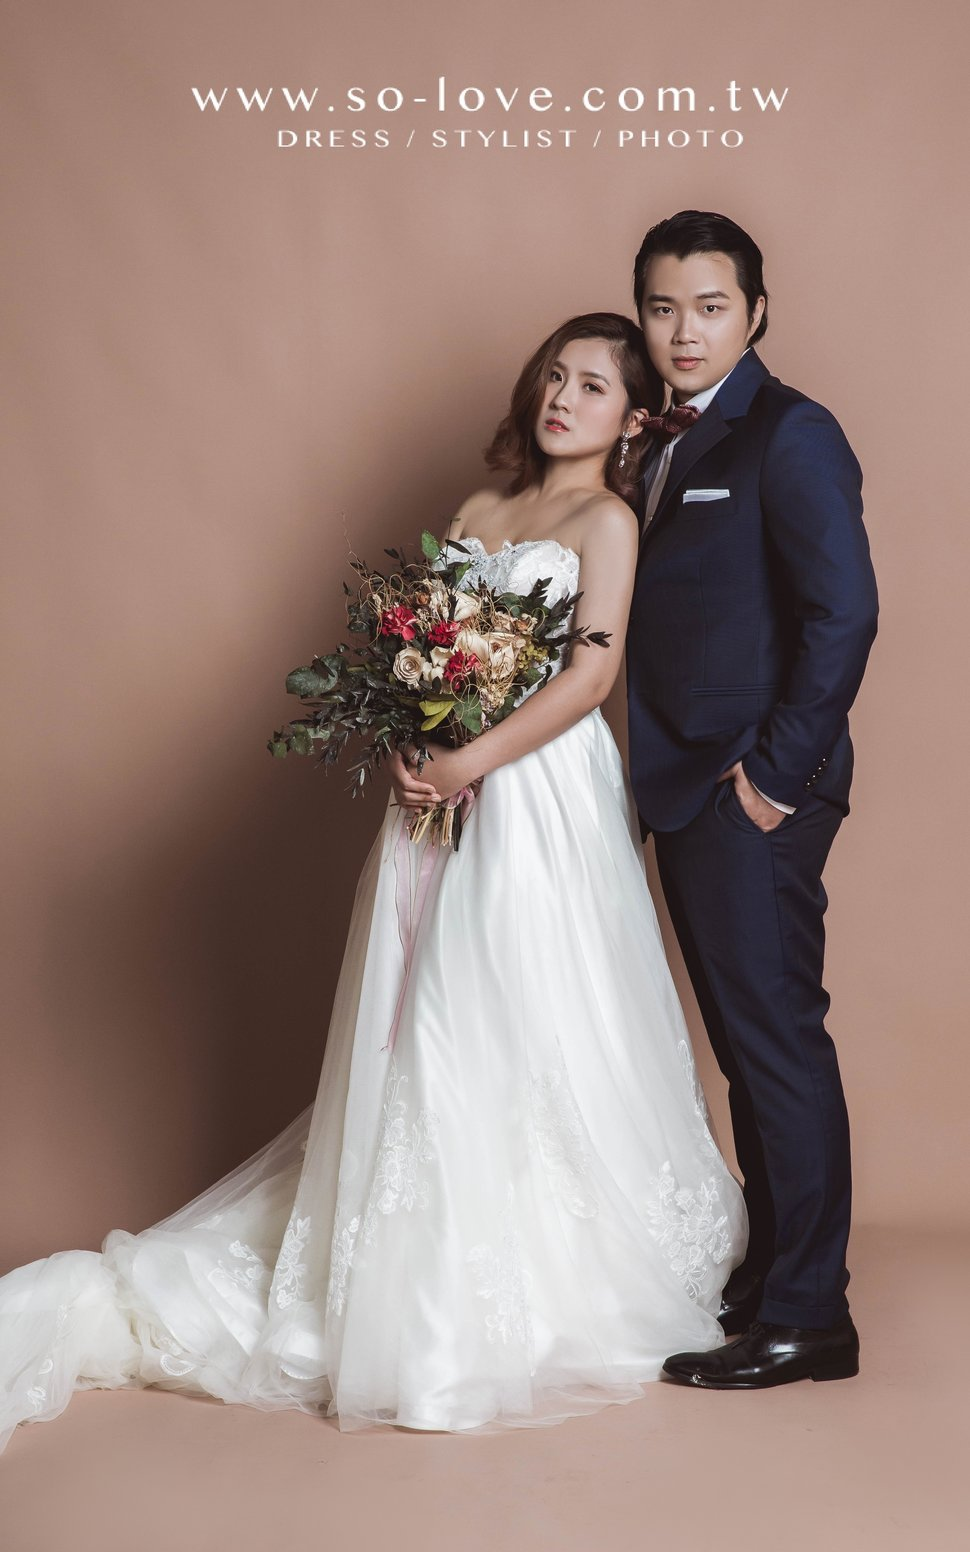 YCG2B8184-裁切 - So.Love Wedding 樂樂蕾絲《結婚吧》